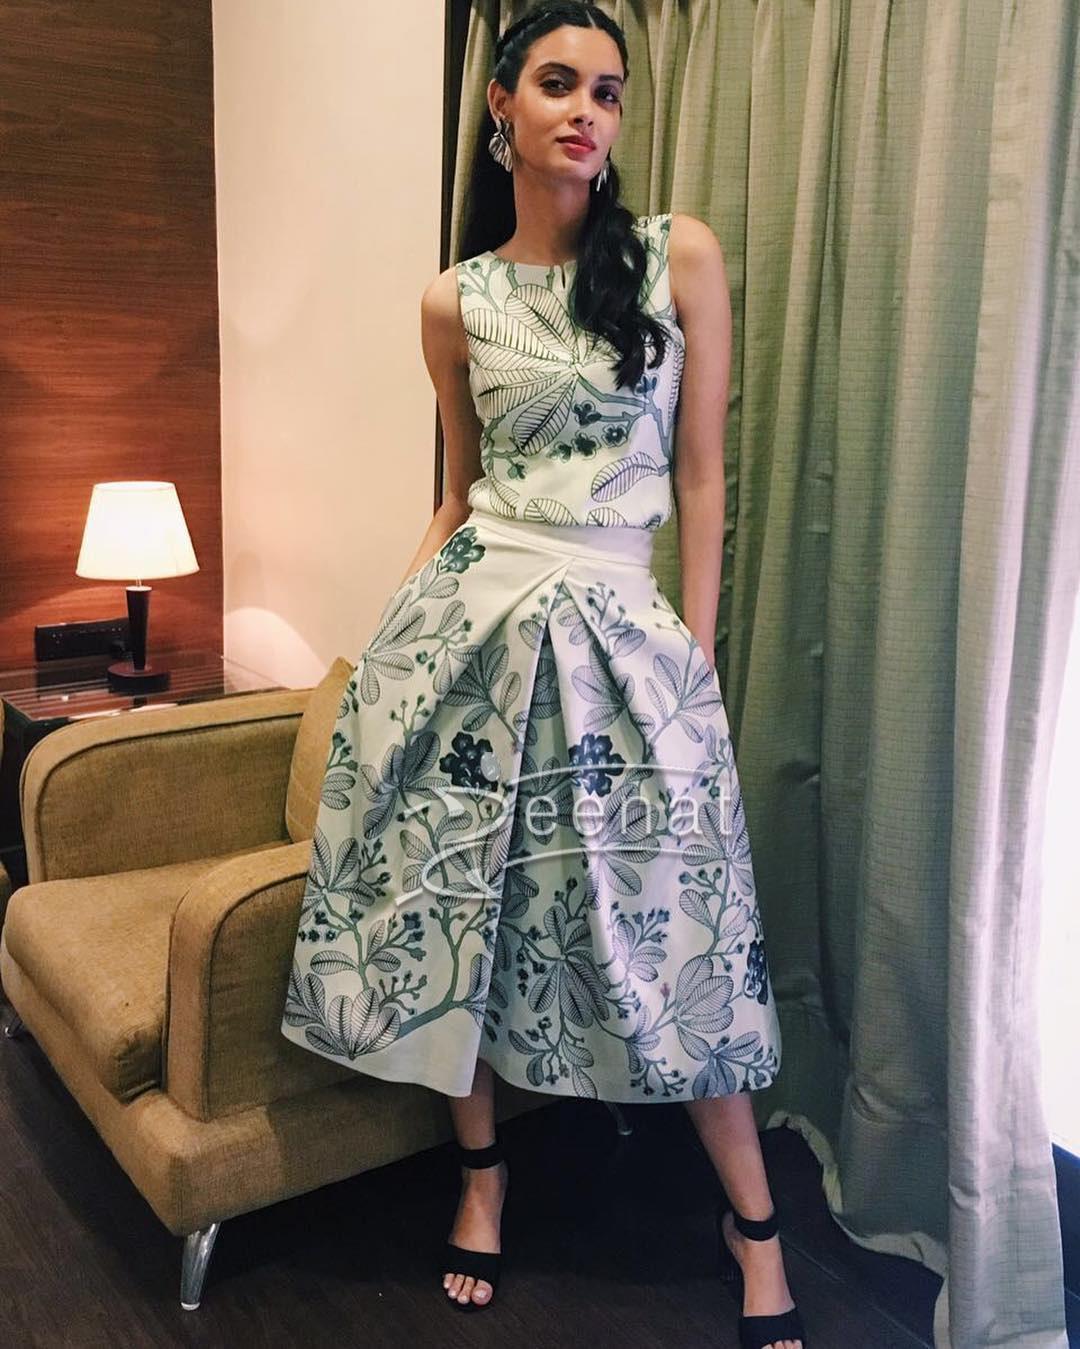 Here she wins the fashion game in Ankur Modi & Priyanka Modi skirt.